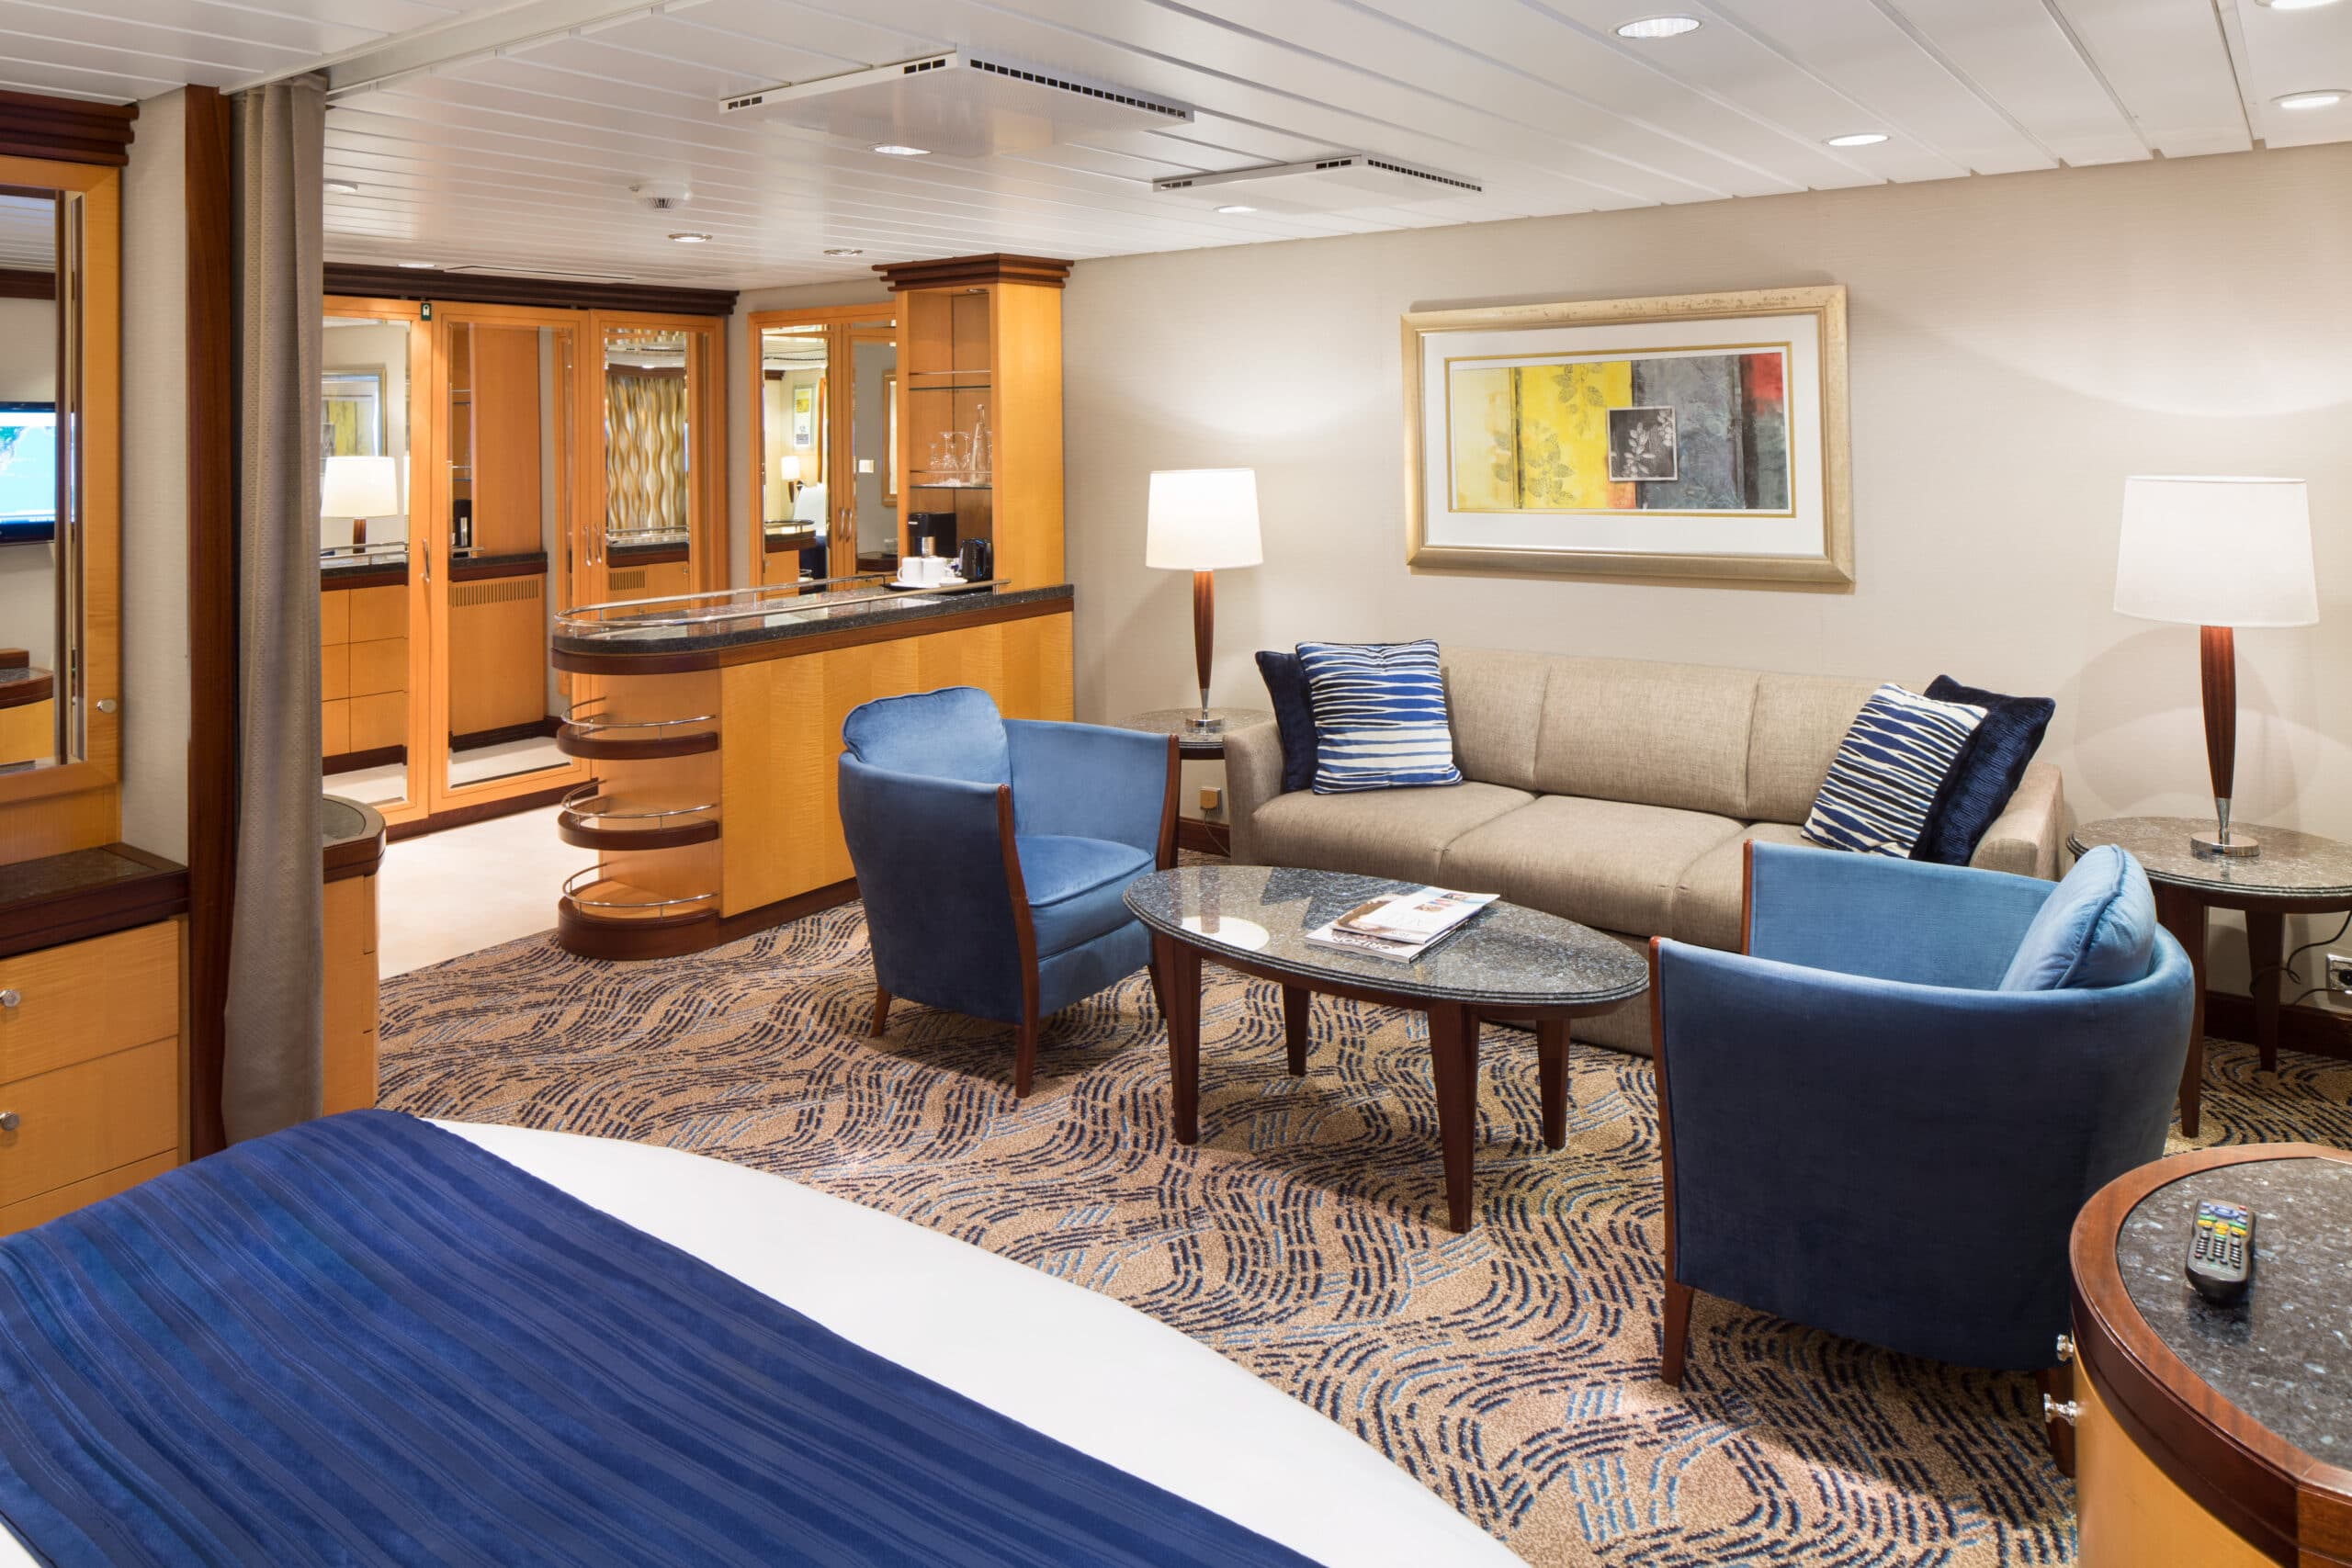 Royal-Caribbean-International-Navigatorof-the-Seas-Voyager-of-the-Seas-schip-cruiseschip-categorie-GT-Grand-Suite-2bedroom